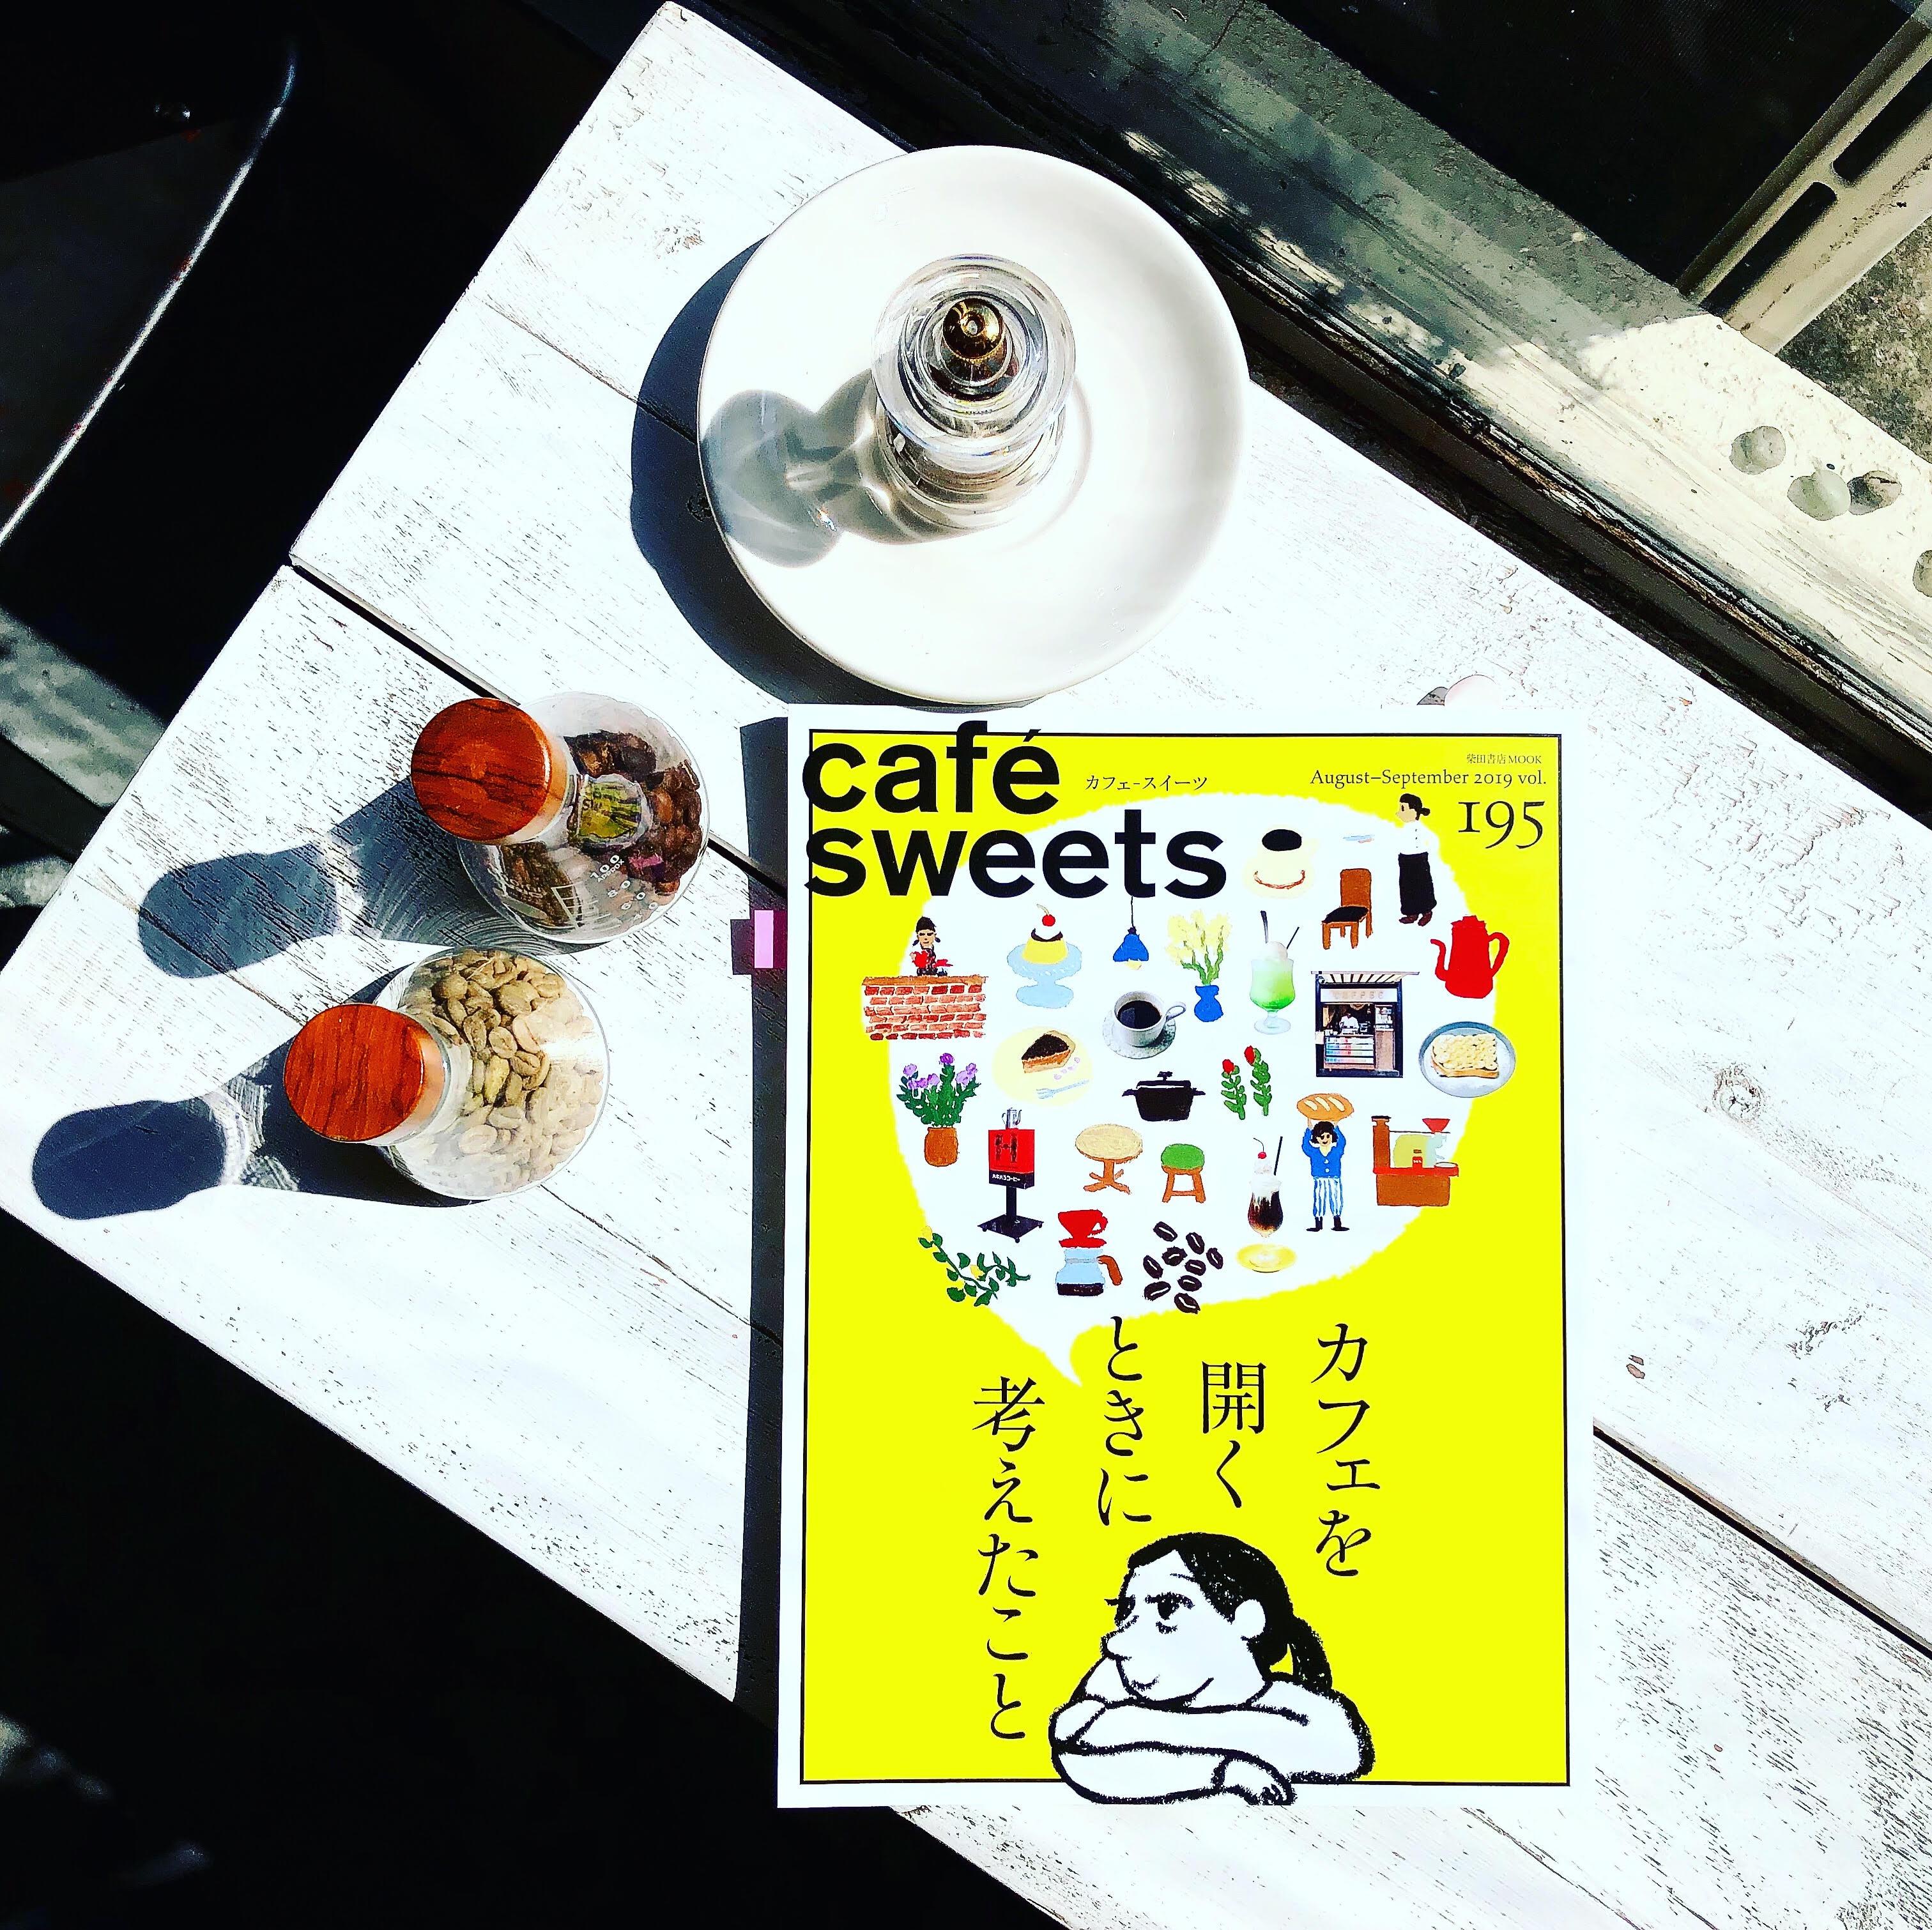 【café-sweets カフェ-スイーツ】掲載情報